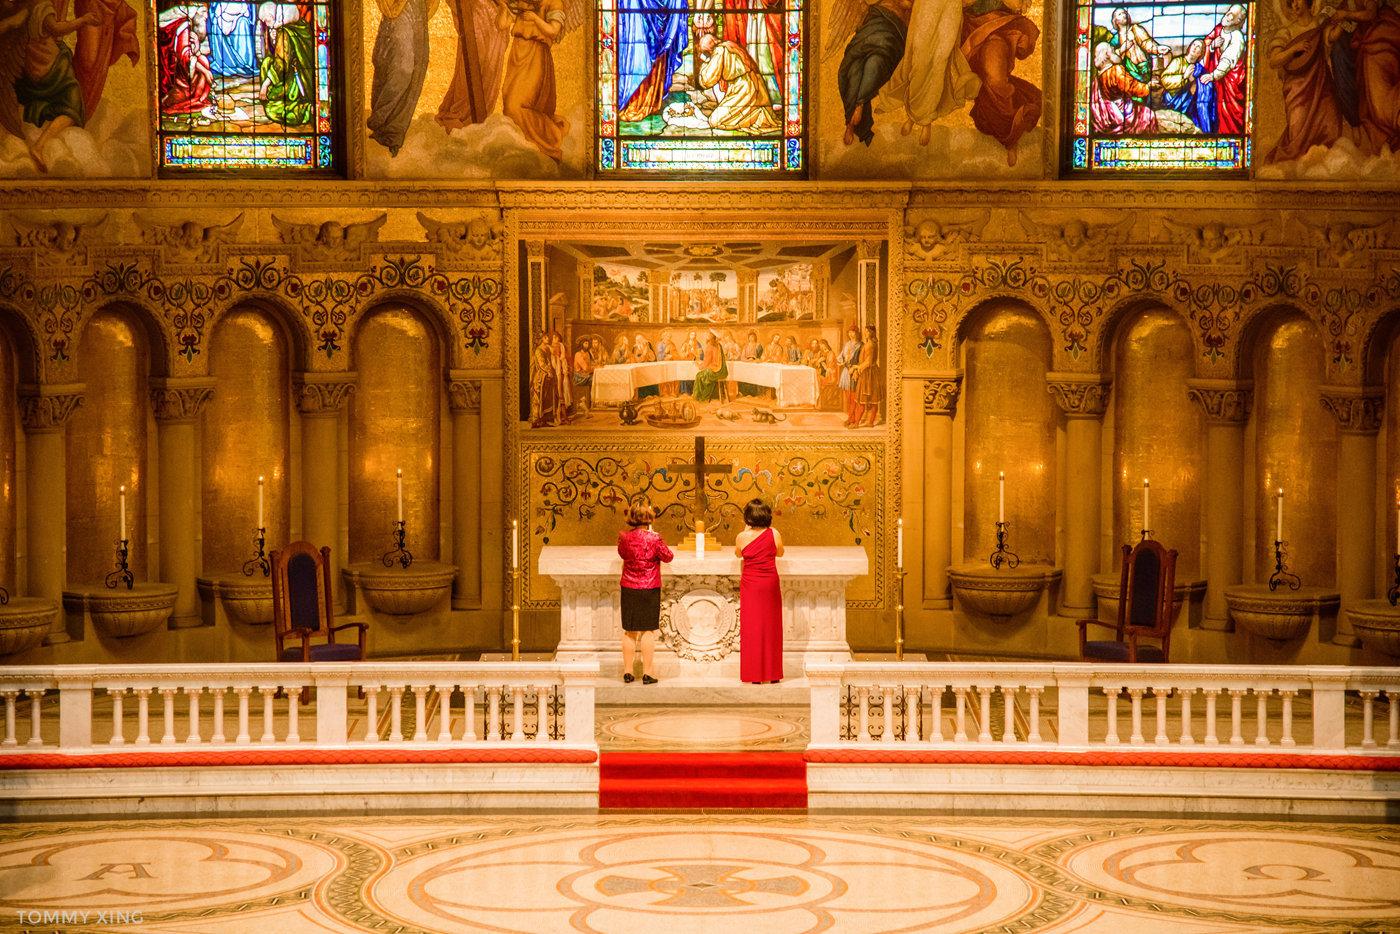 STANFORD MEMORIAL CHURCH WEDDING - Wenjie & Chengcheng - SAN FRANCISCO BAY AREA 斯坦福教堂婚礼跟拍 - 洛杉矶婚礼婚纱照摄影师 Tommy Xing Photography057.jpg